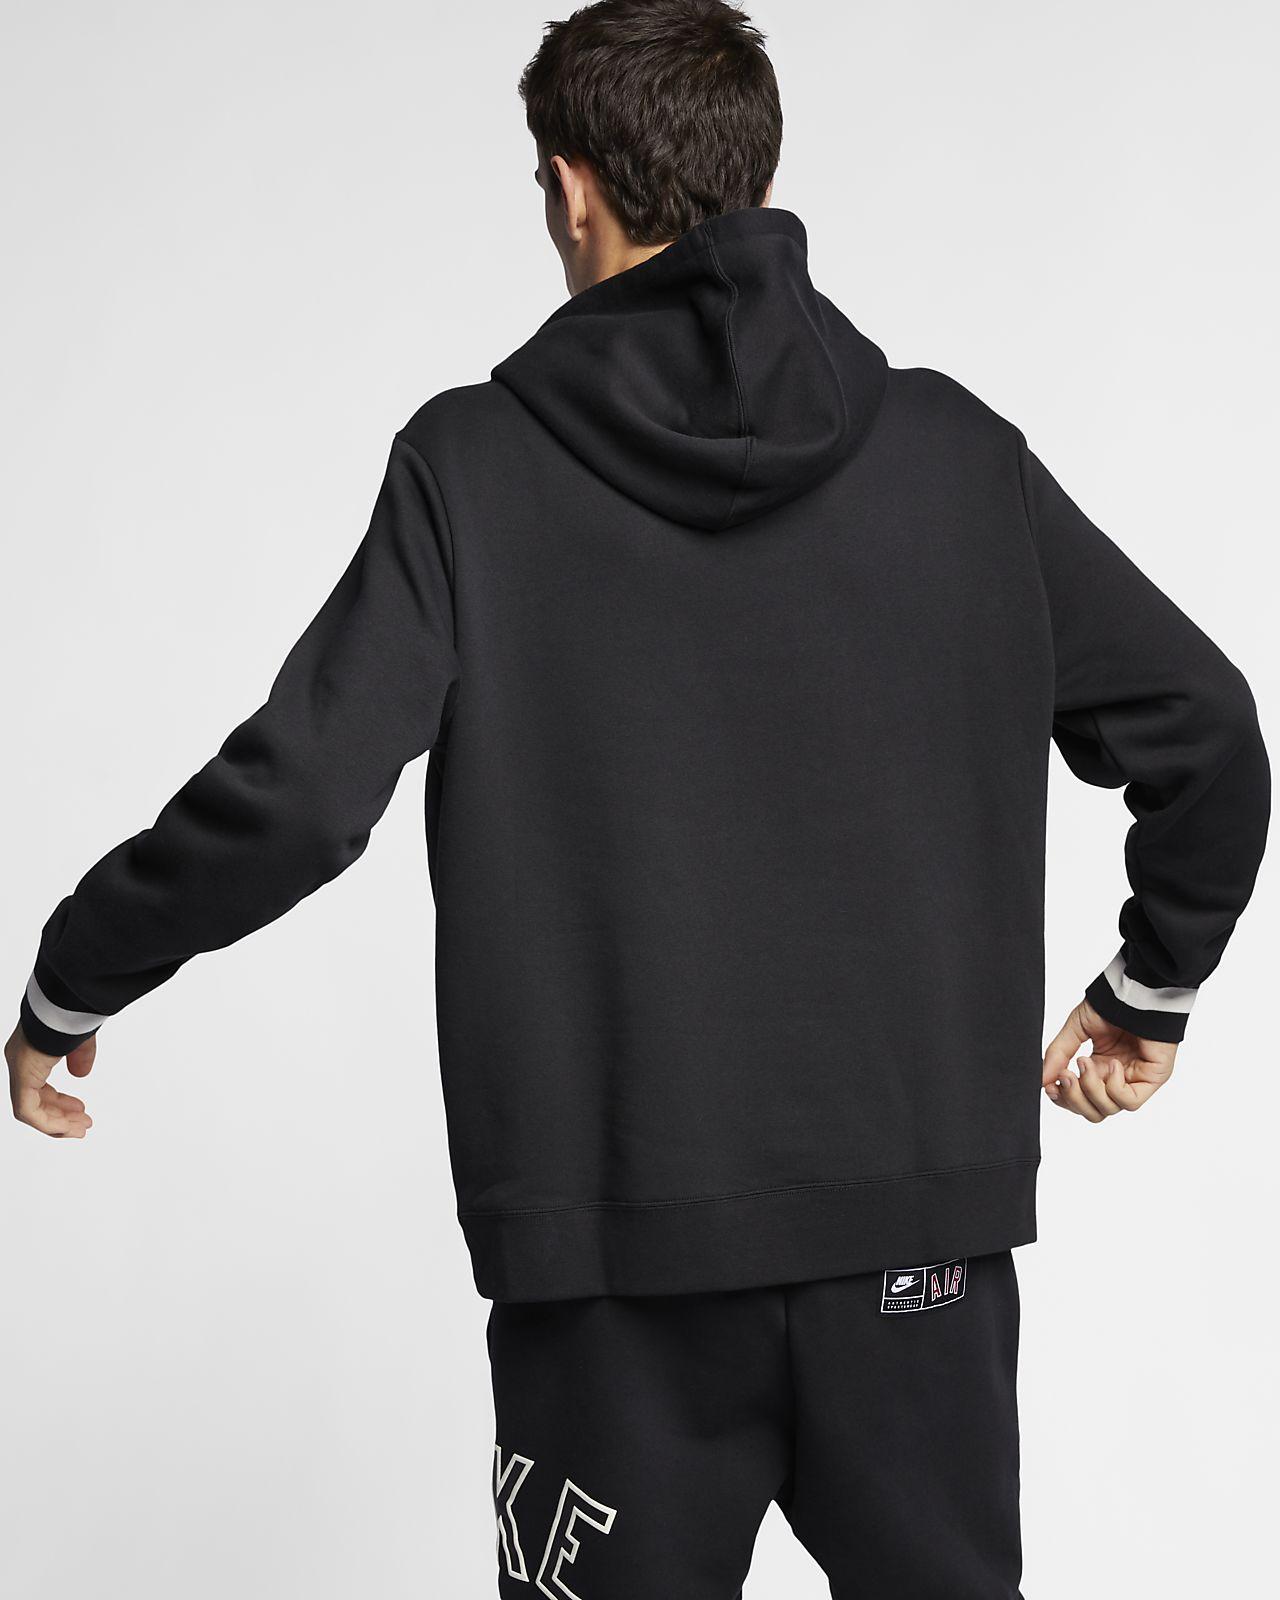 0dc7dceb762c Nike Air Men s Fleece Pullover Hoodie. Nike.com